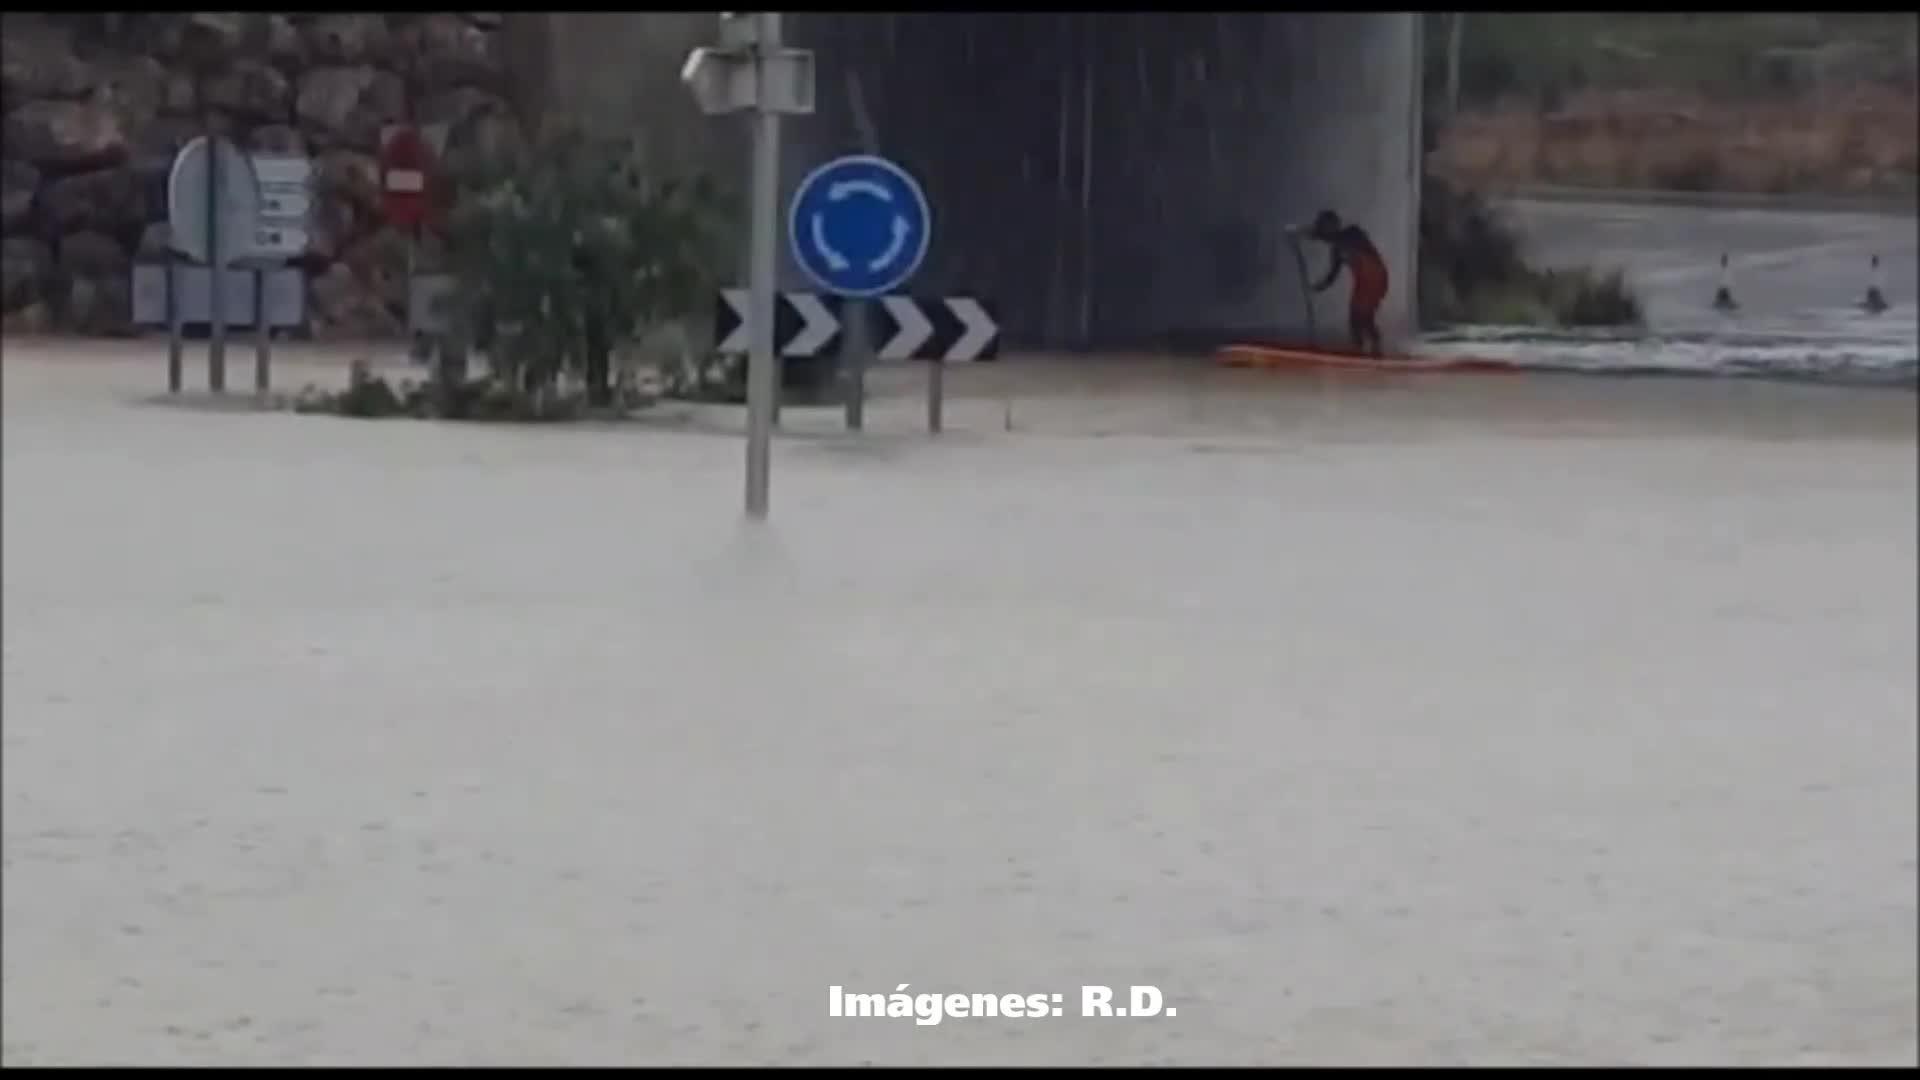 Numerosos incidentes en Mallorca por el temporal de lluvia